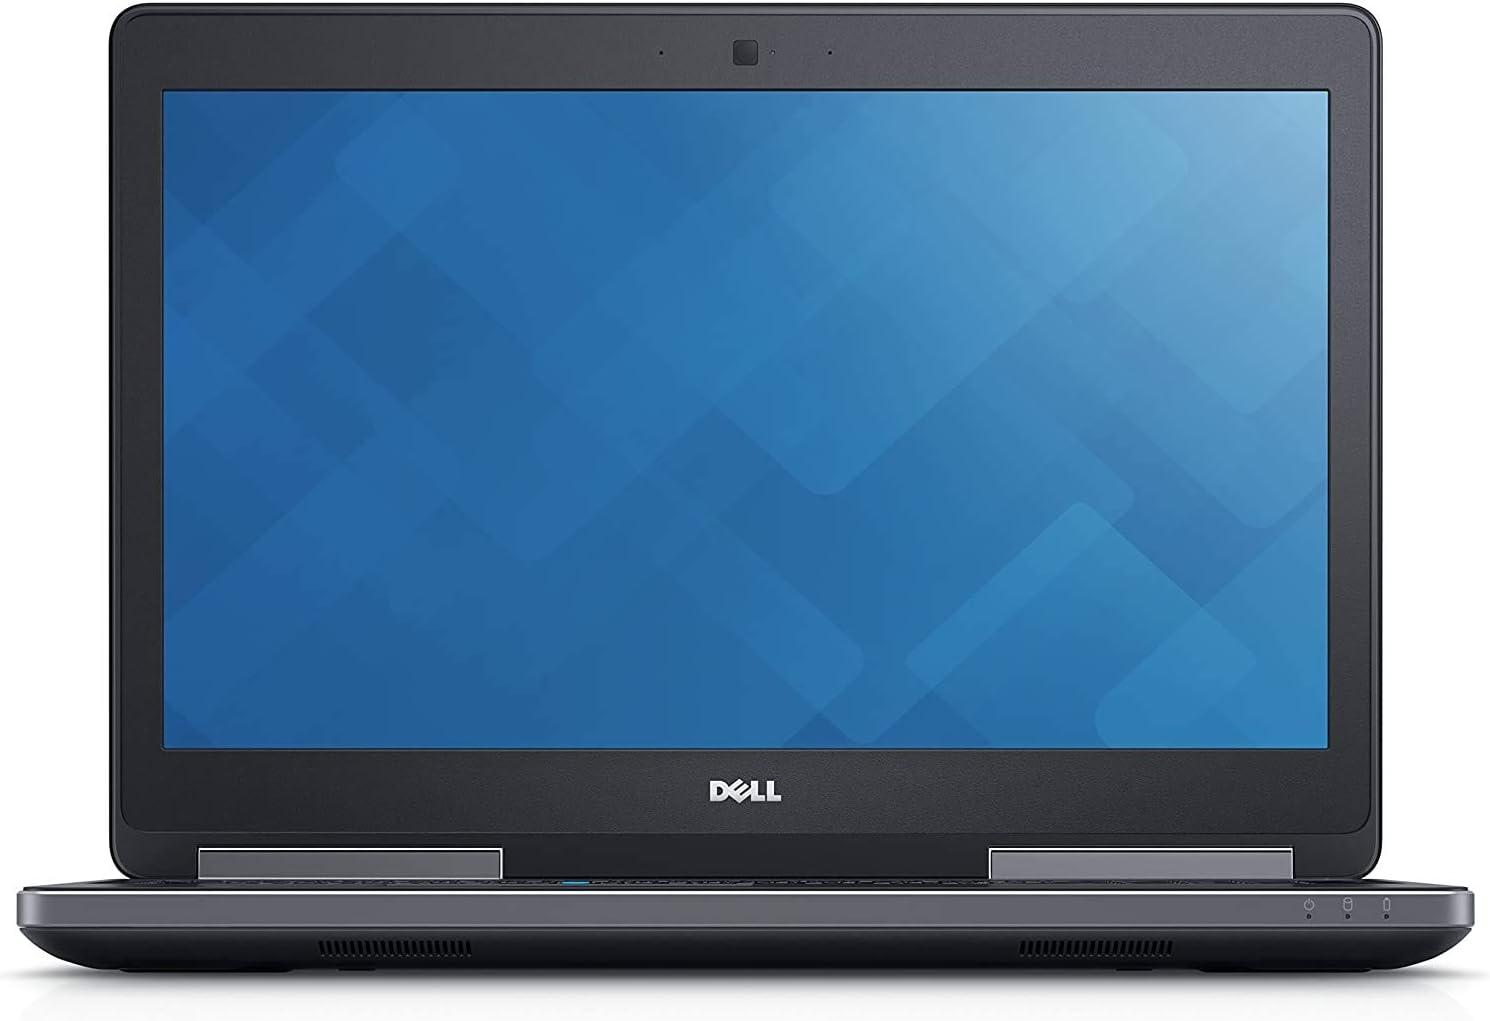 Dell Precision 7510 15.6-Inch HD Laptop with M1000M Graphics (i7-6820HQ, 500GB HDD, 16GB RAM) Windows 10 Pro (Renewed)